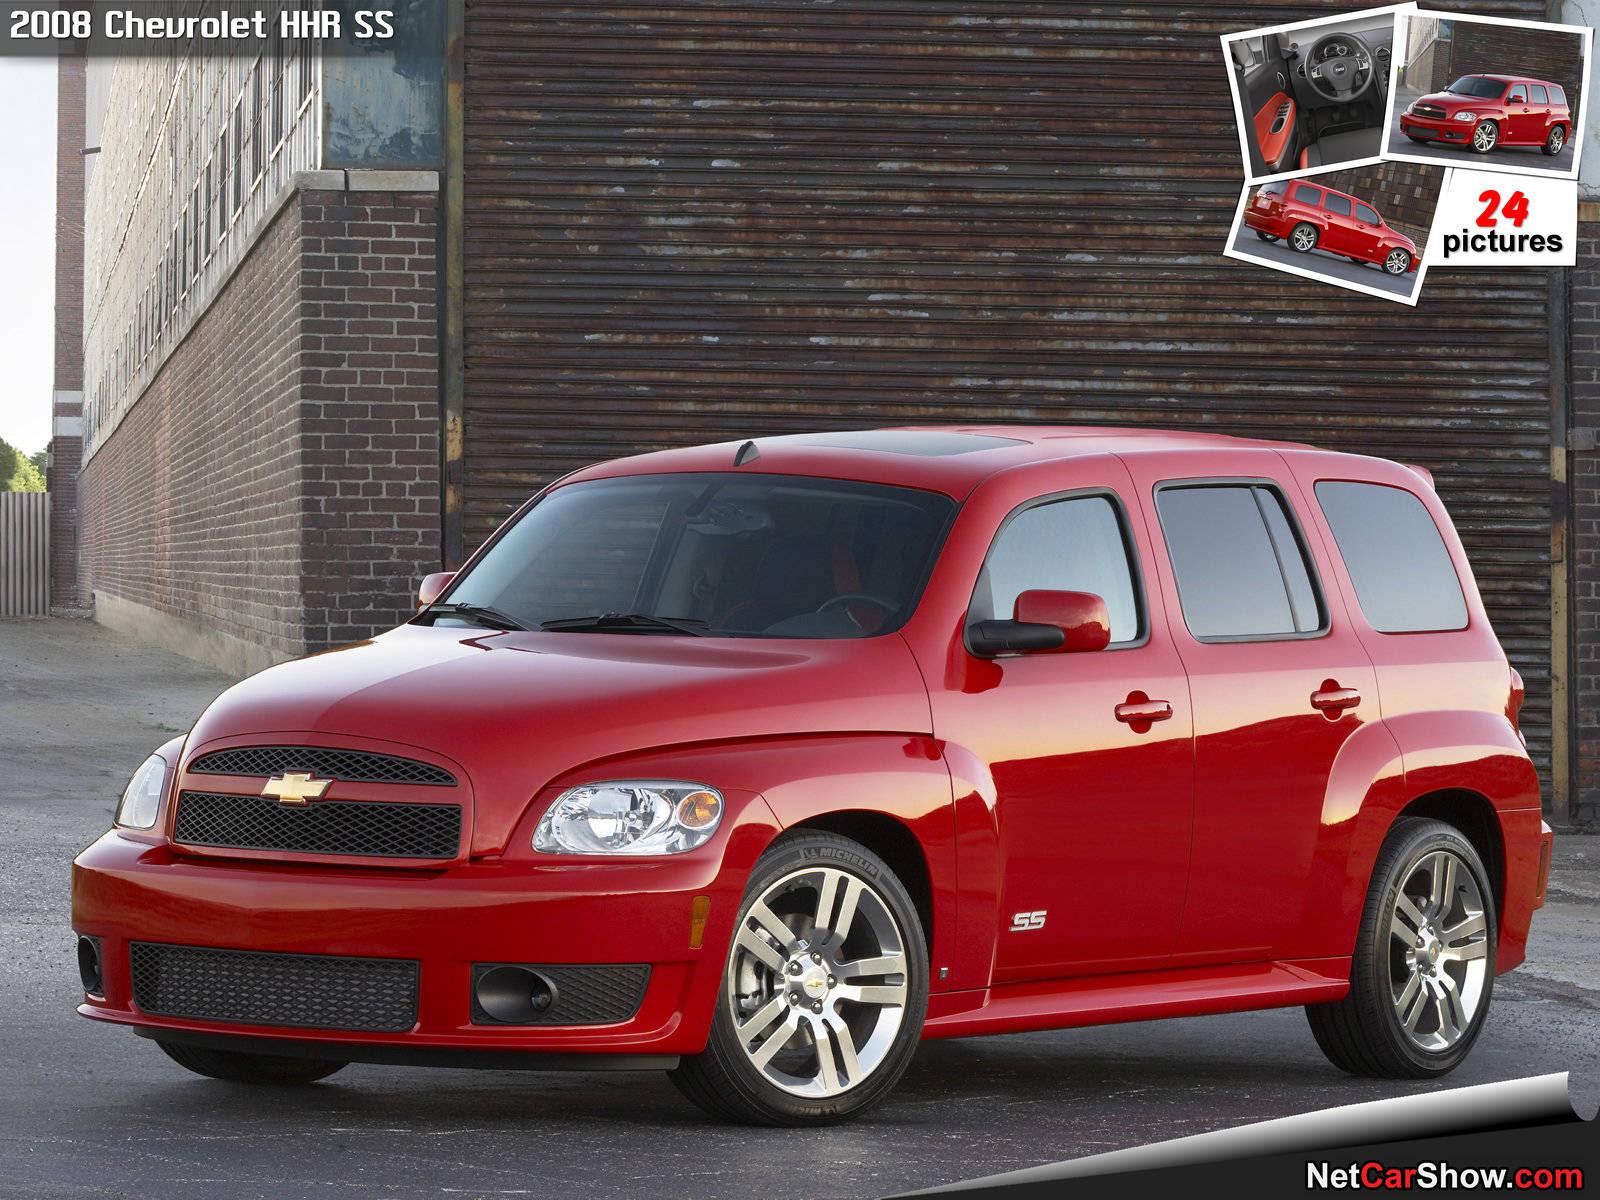 Chevrolet HHR SS (2008)